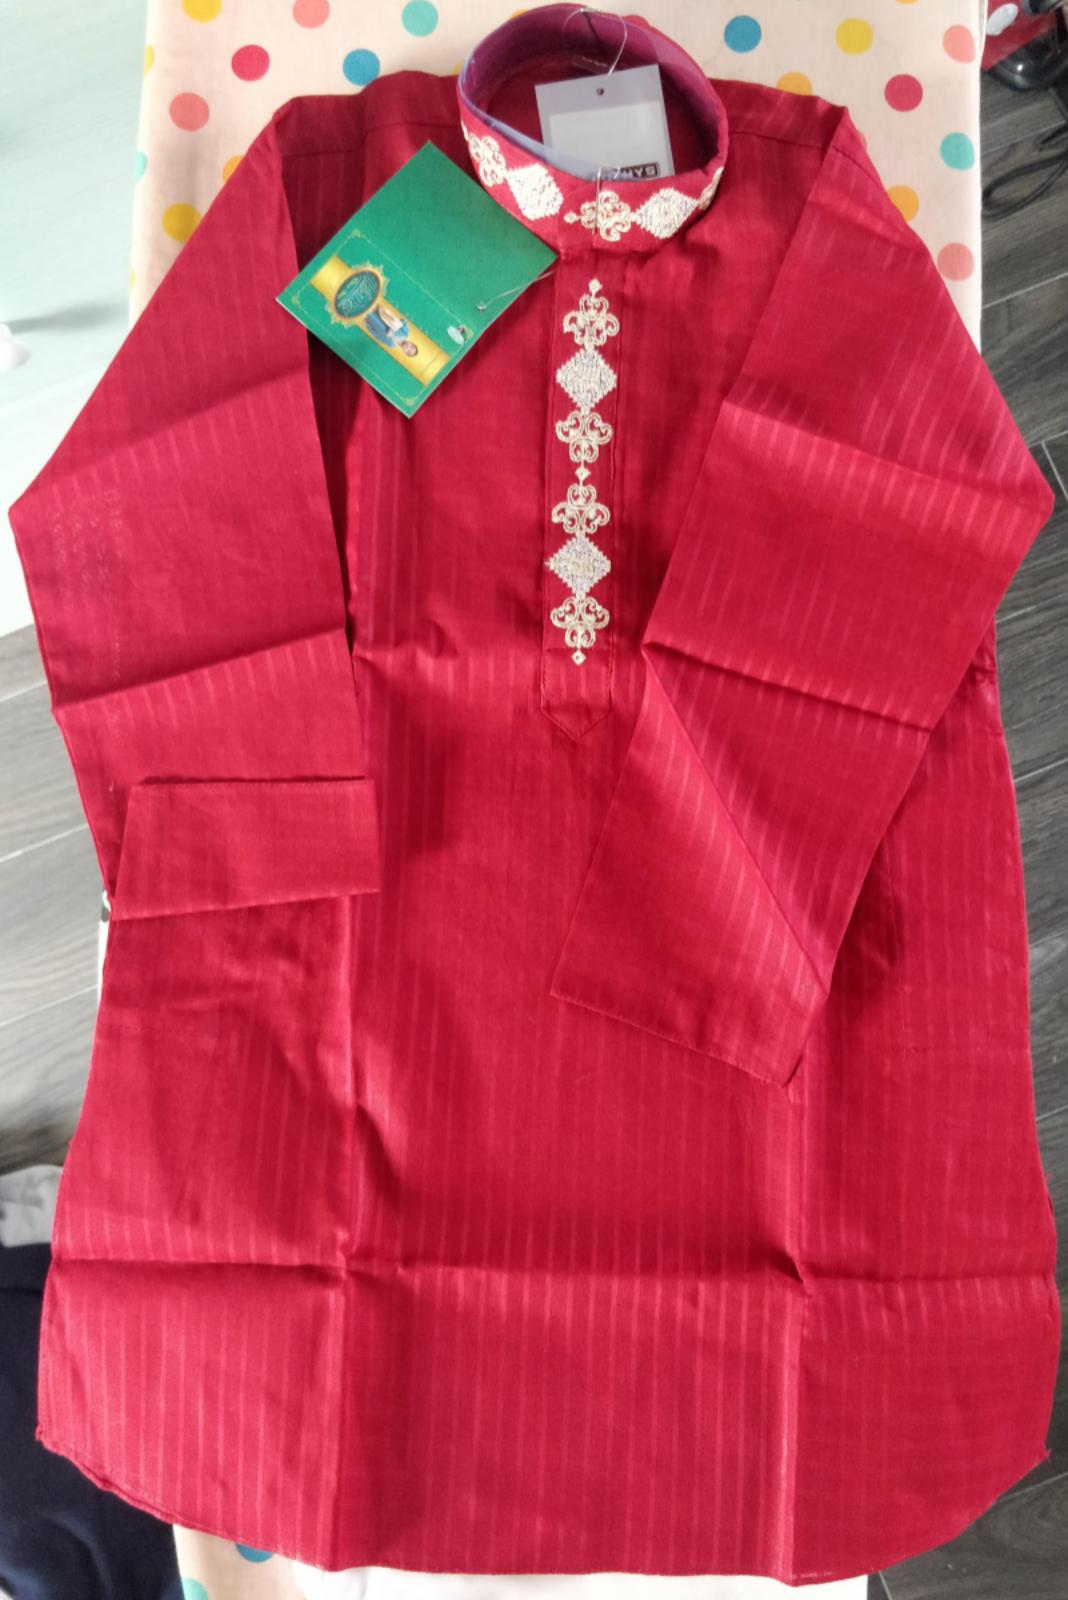 Pothys brand new Boys kurtha sherwani set Size 24 (Age 4-5)